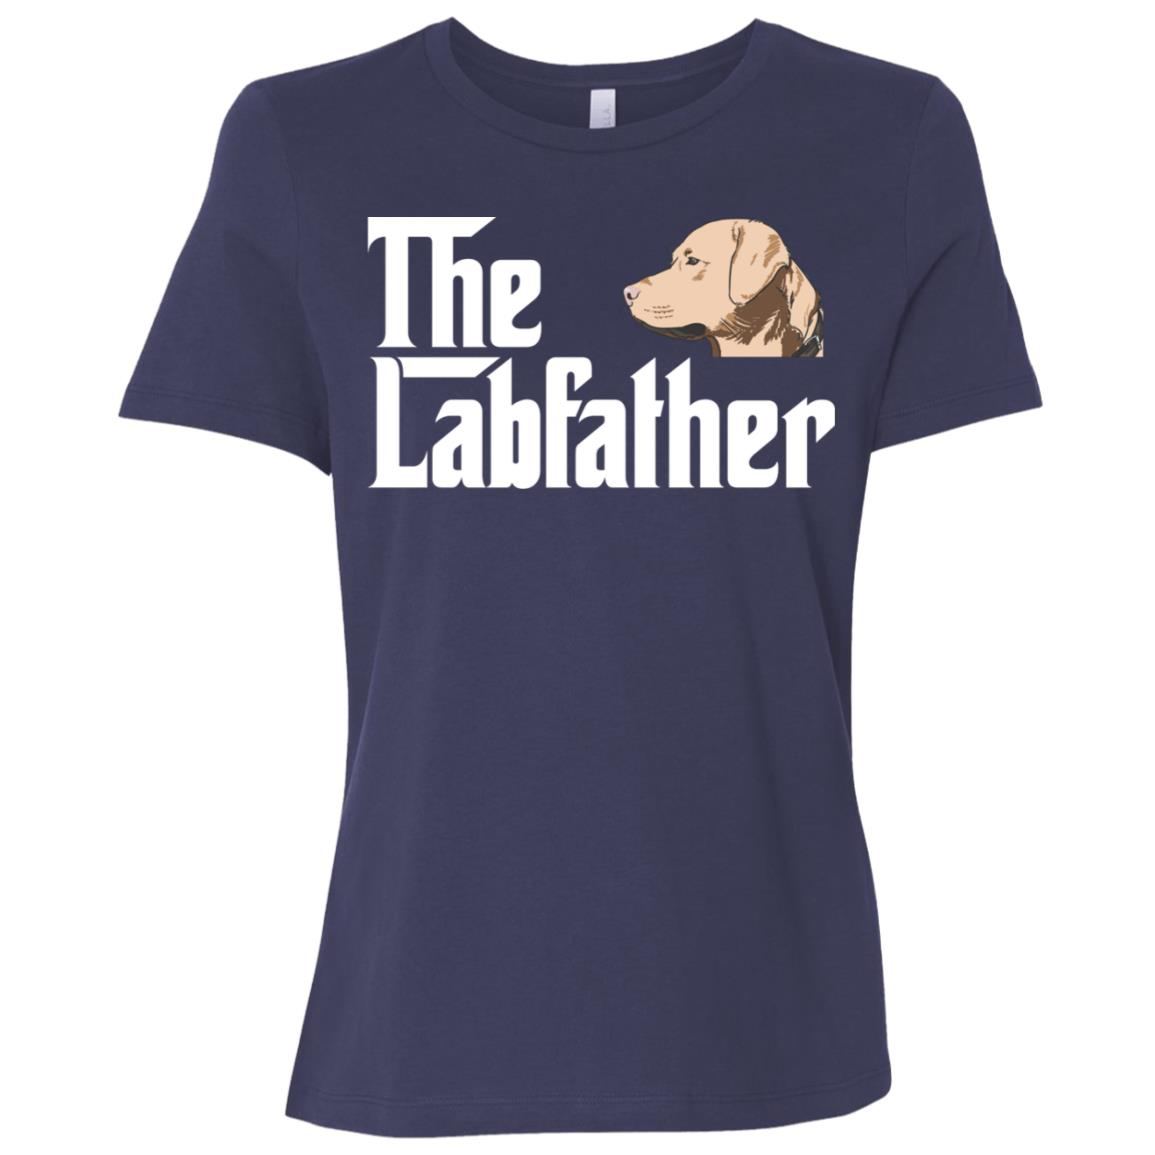 The Lab Father Funny Labrador Retriever Gift Women Short Sleeve T-Shirt